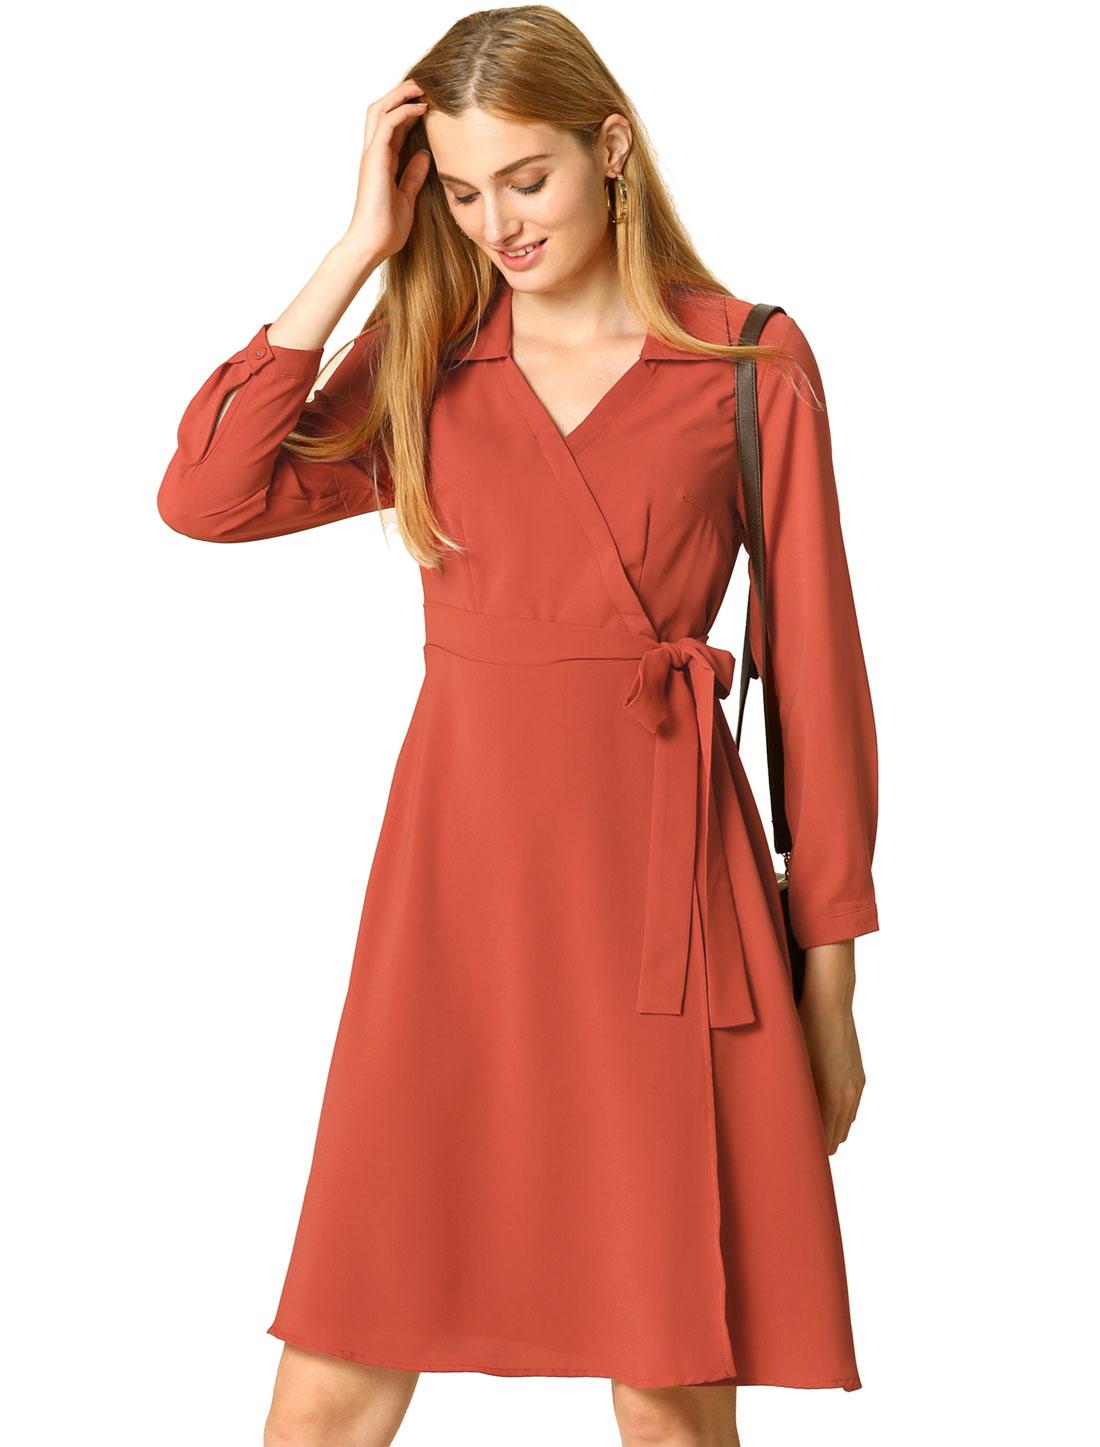 Allegra K Women's Casual Long Sleeve V Neck Tie Waist A-line Dress Orange Red XL